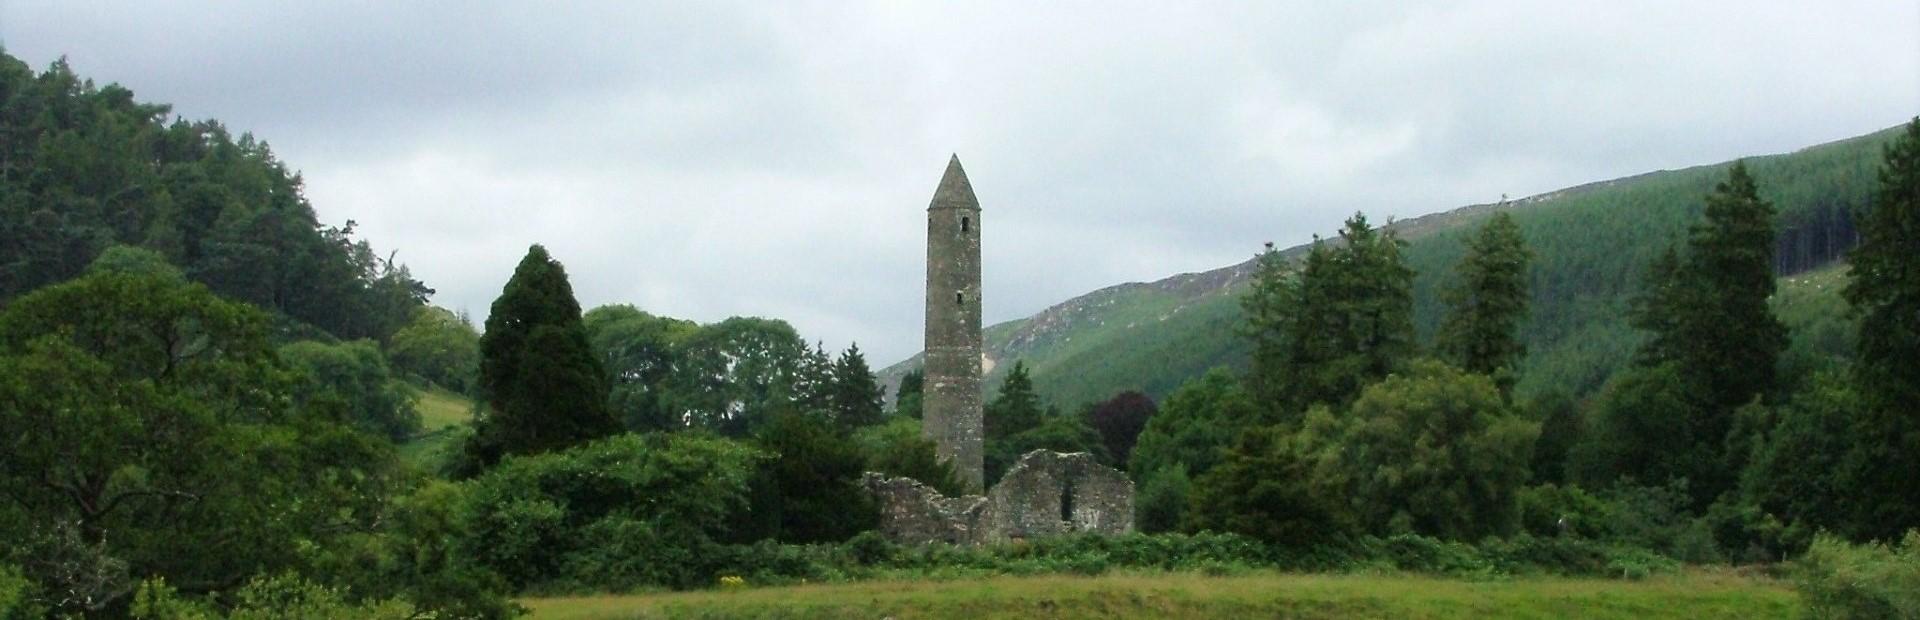 Ireland Glendalough_Rundturm1 a